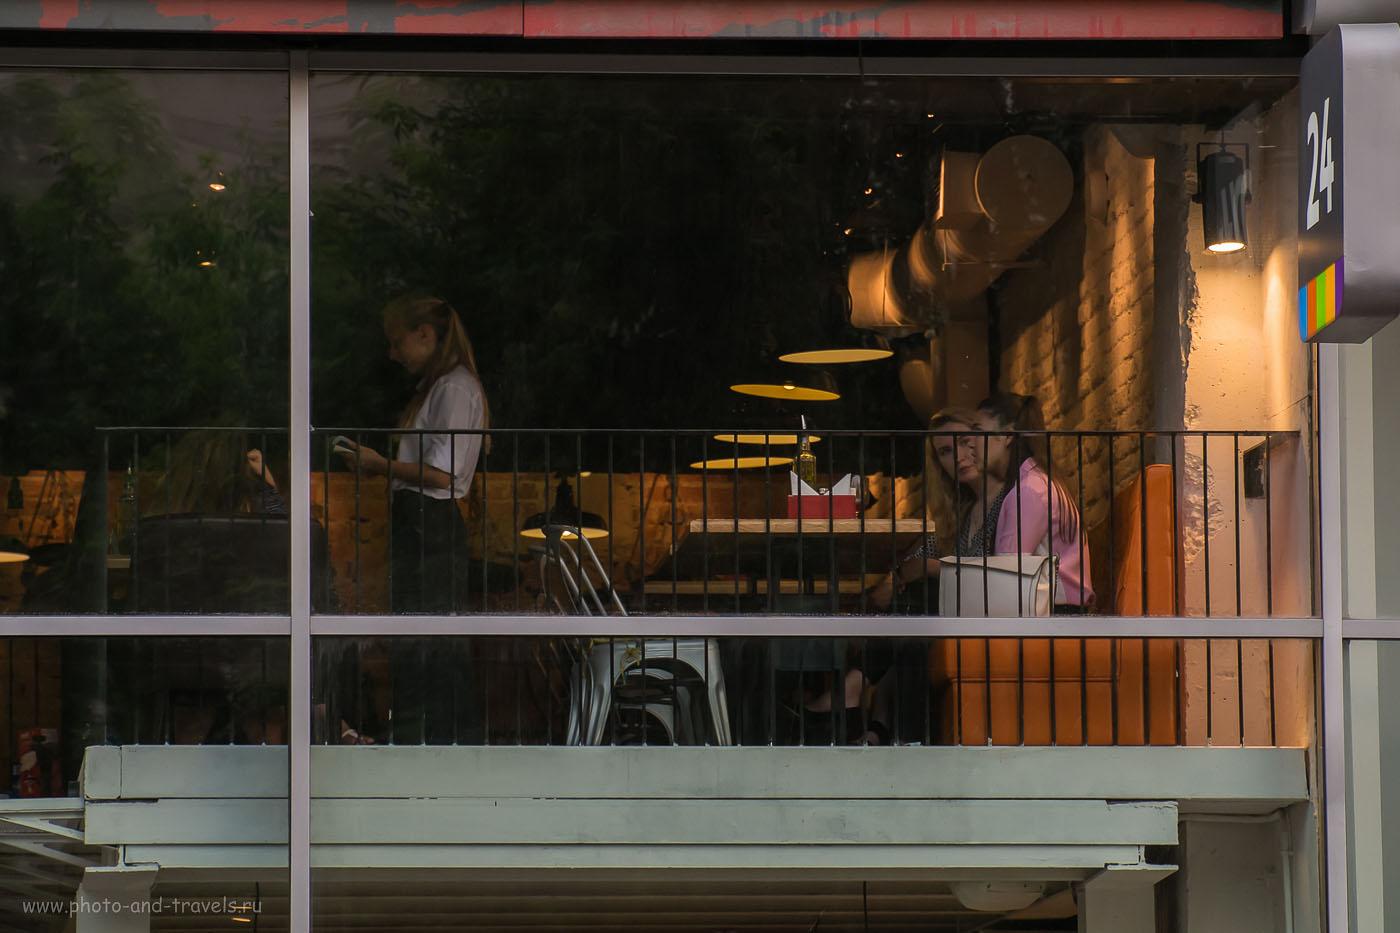 Фото 26. Вечер в кафе (640, 135.7, 6.0, 1/125). Съемка на беззеркальный фотоаппарат Фуджифильм